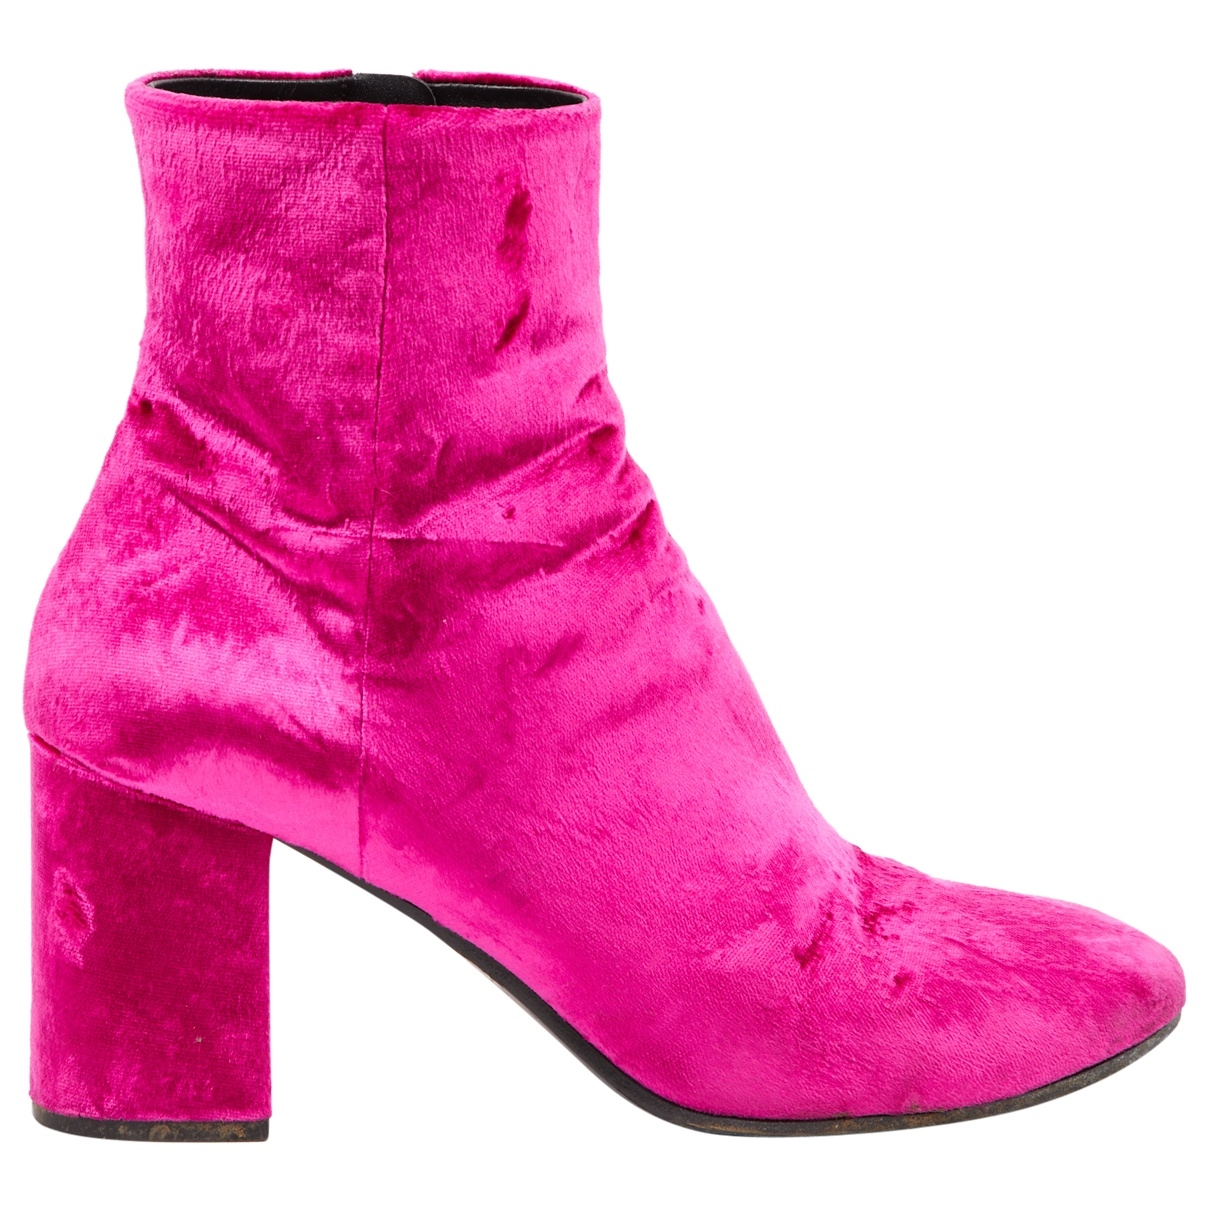 Balenciaga - Bottes   pour femme en velours - rose